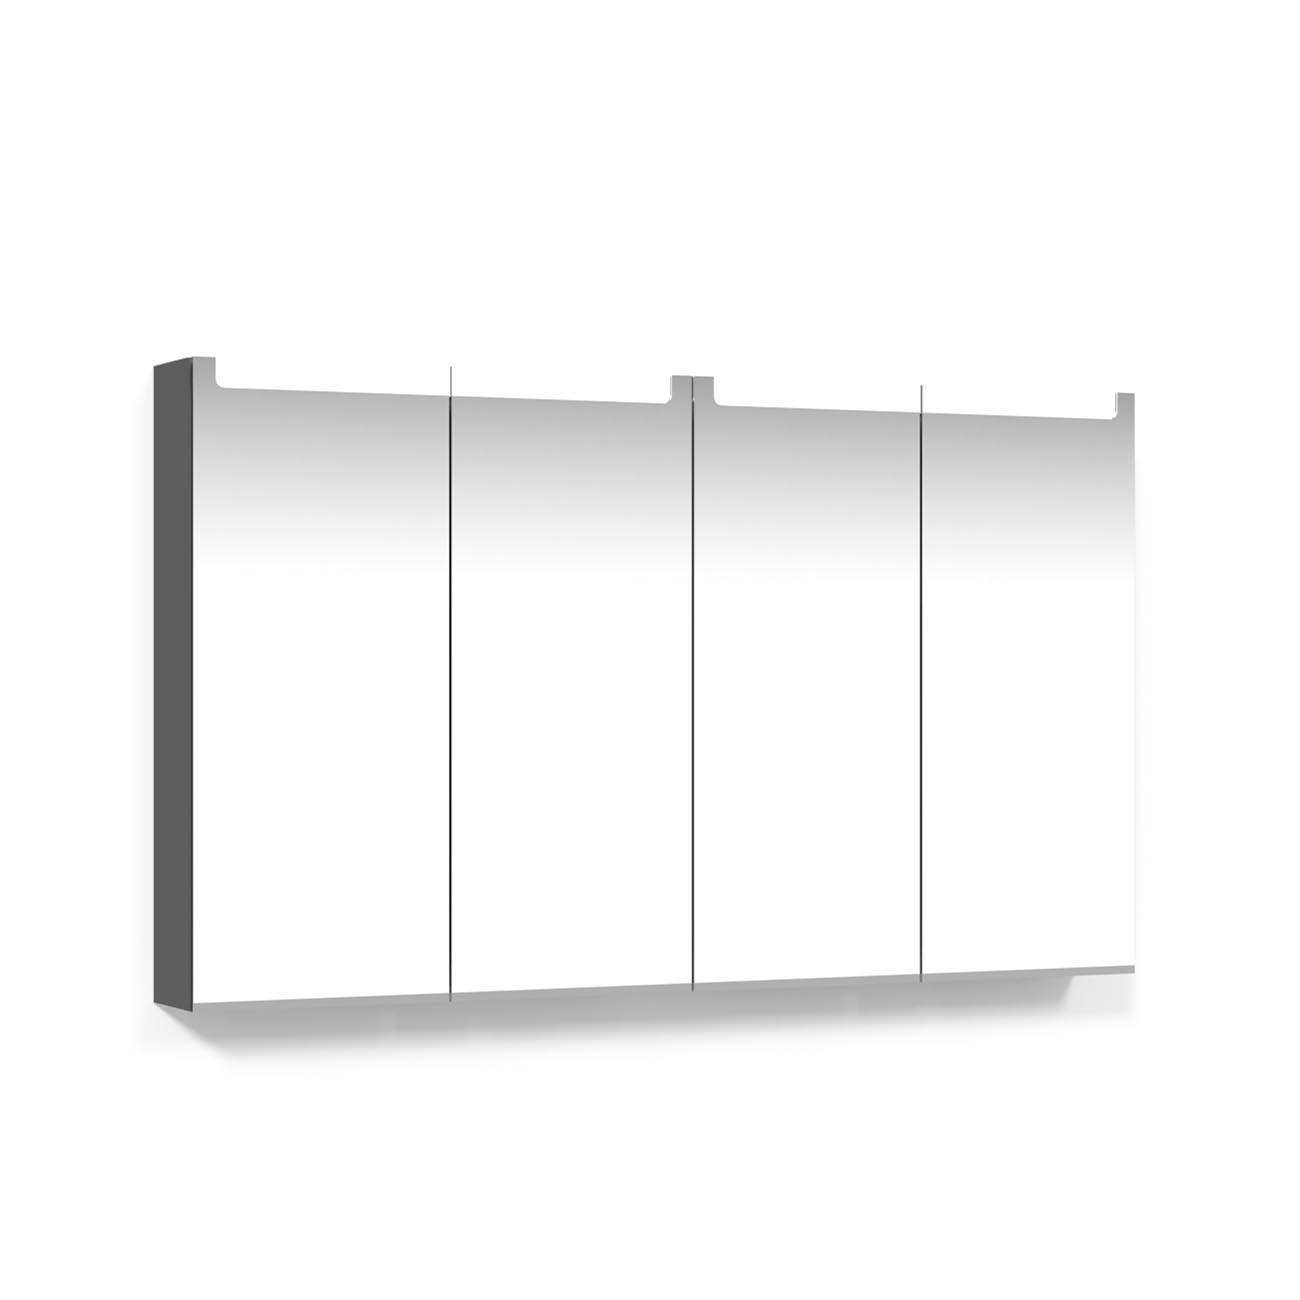 Spegelskåp Macro Design 1200 Infälld LED